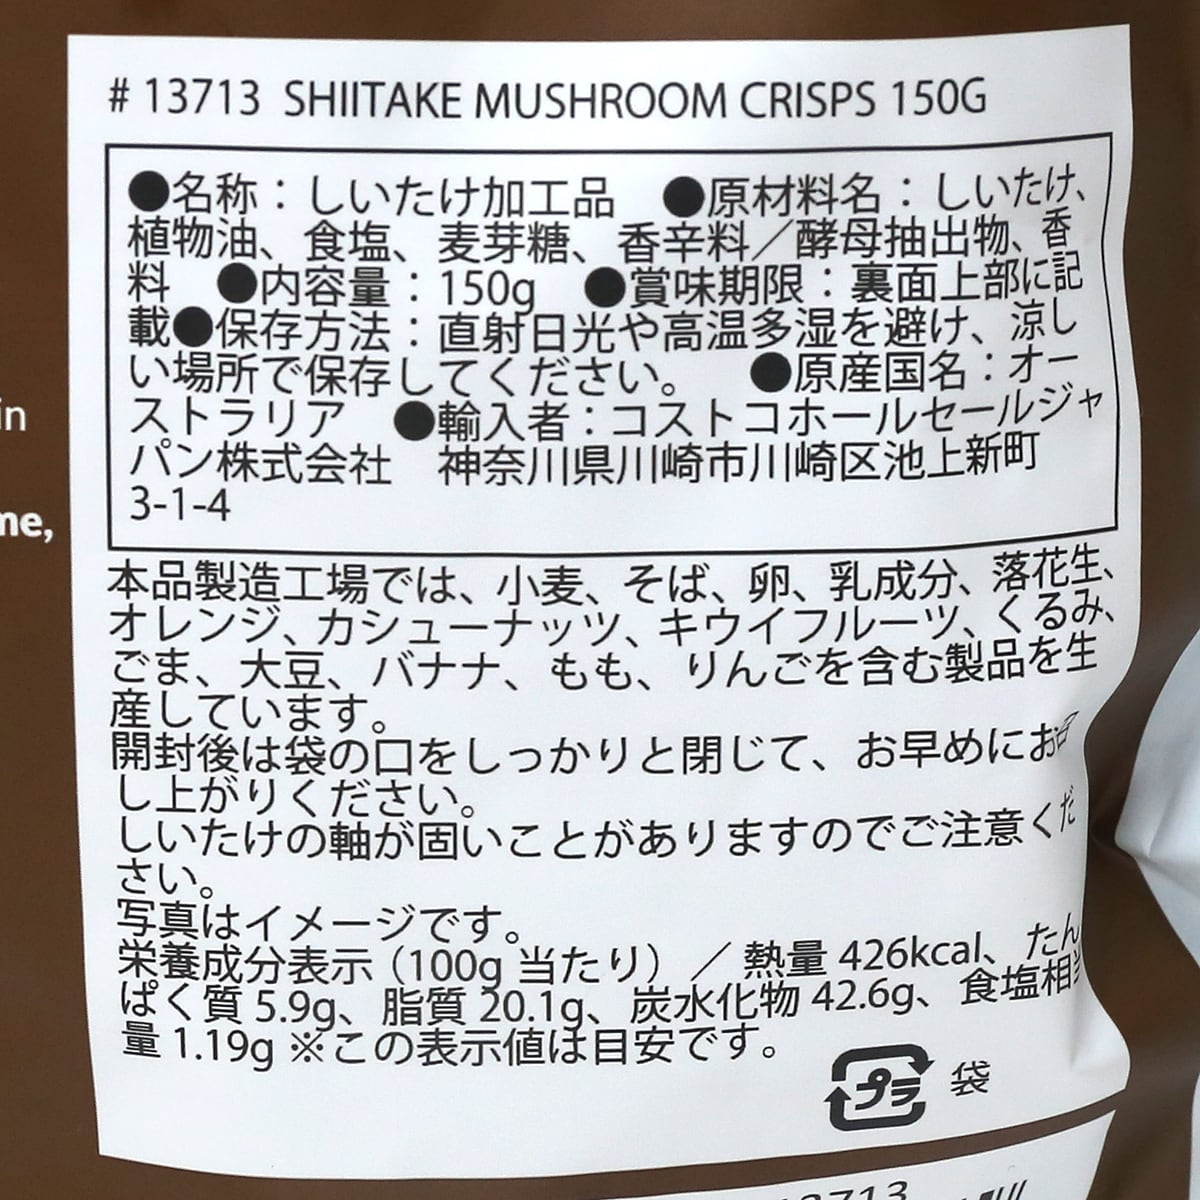 DJ&A しいたけマッシュルームクリスプ 裏面ラベル(原材料・カロリーほか)